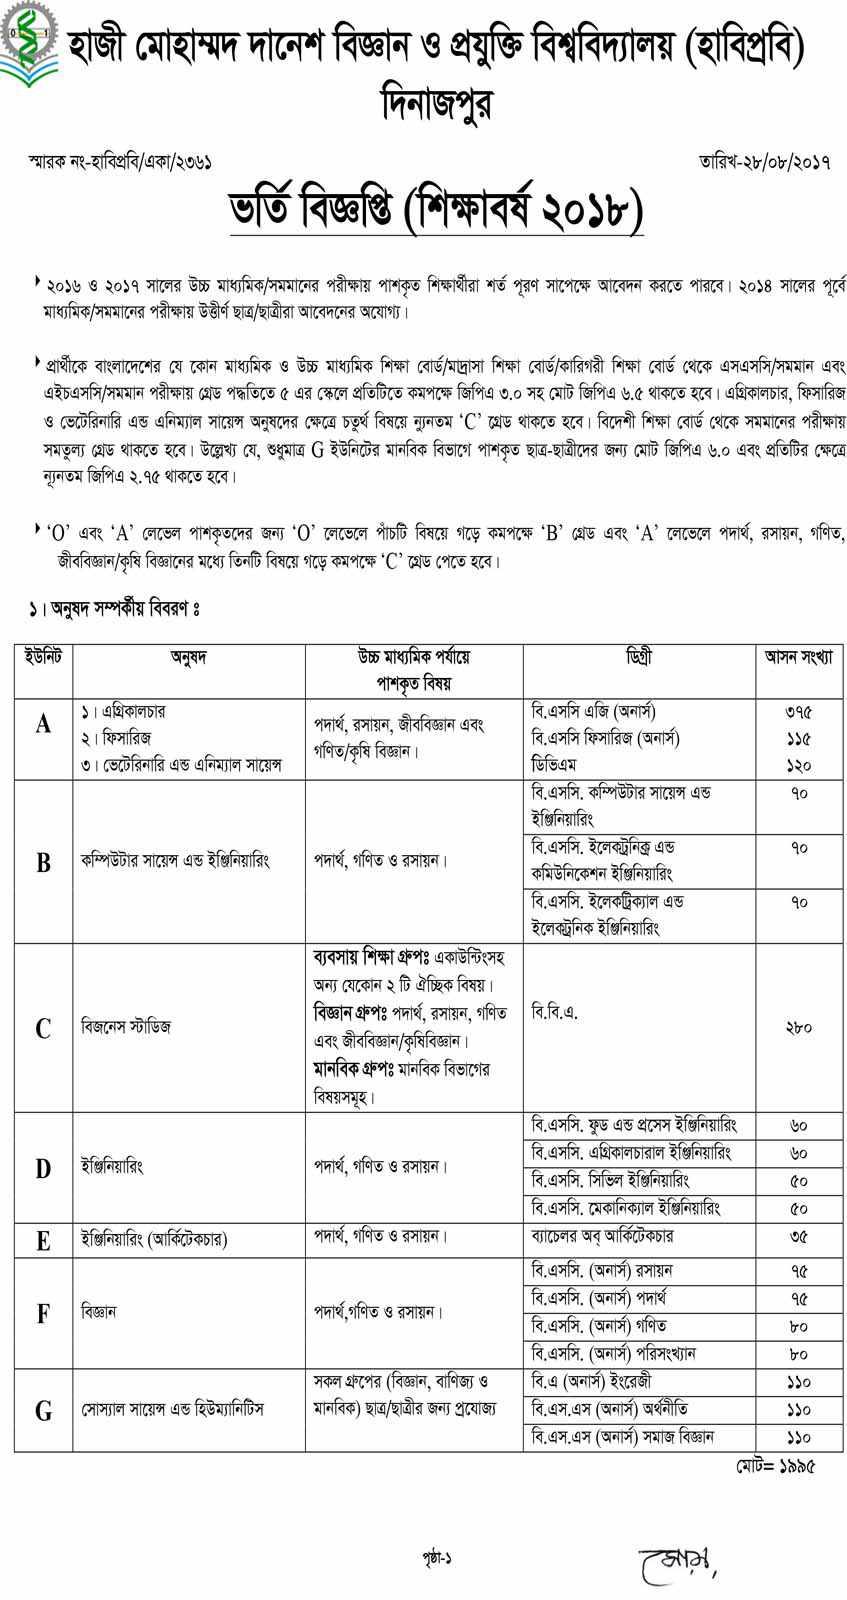 hust-admission-test-notice-2017-18